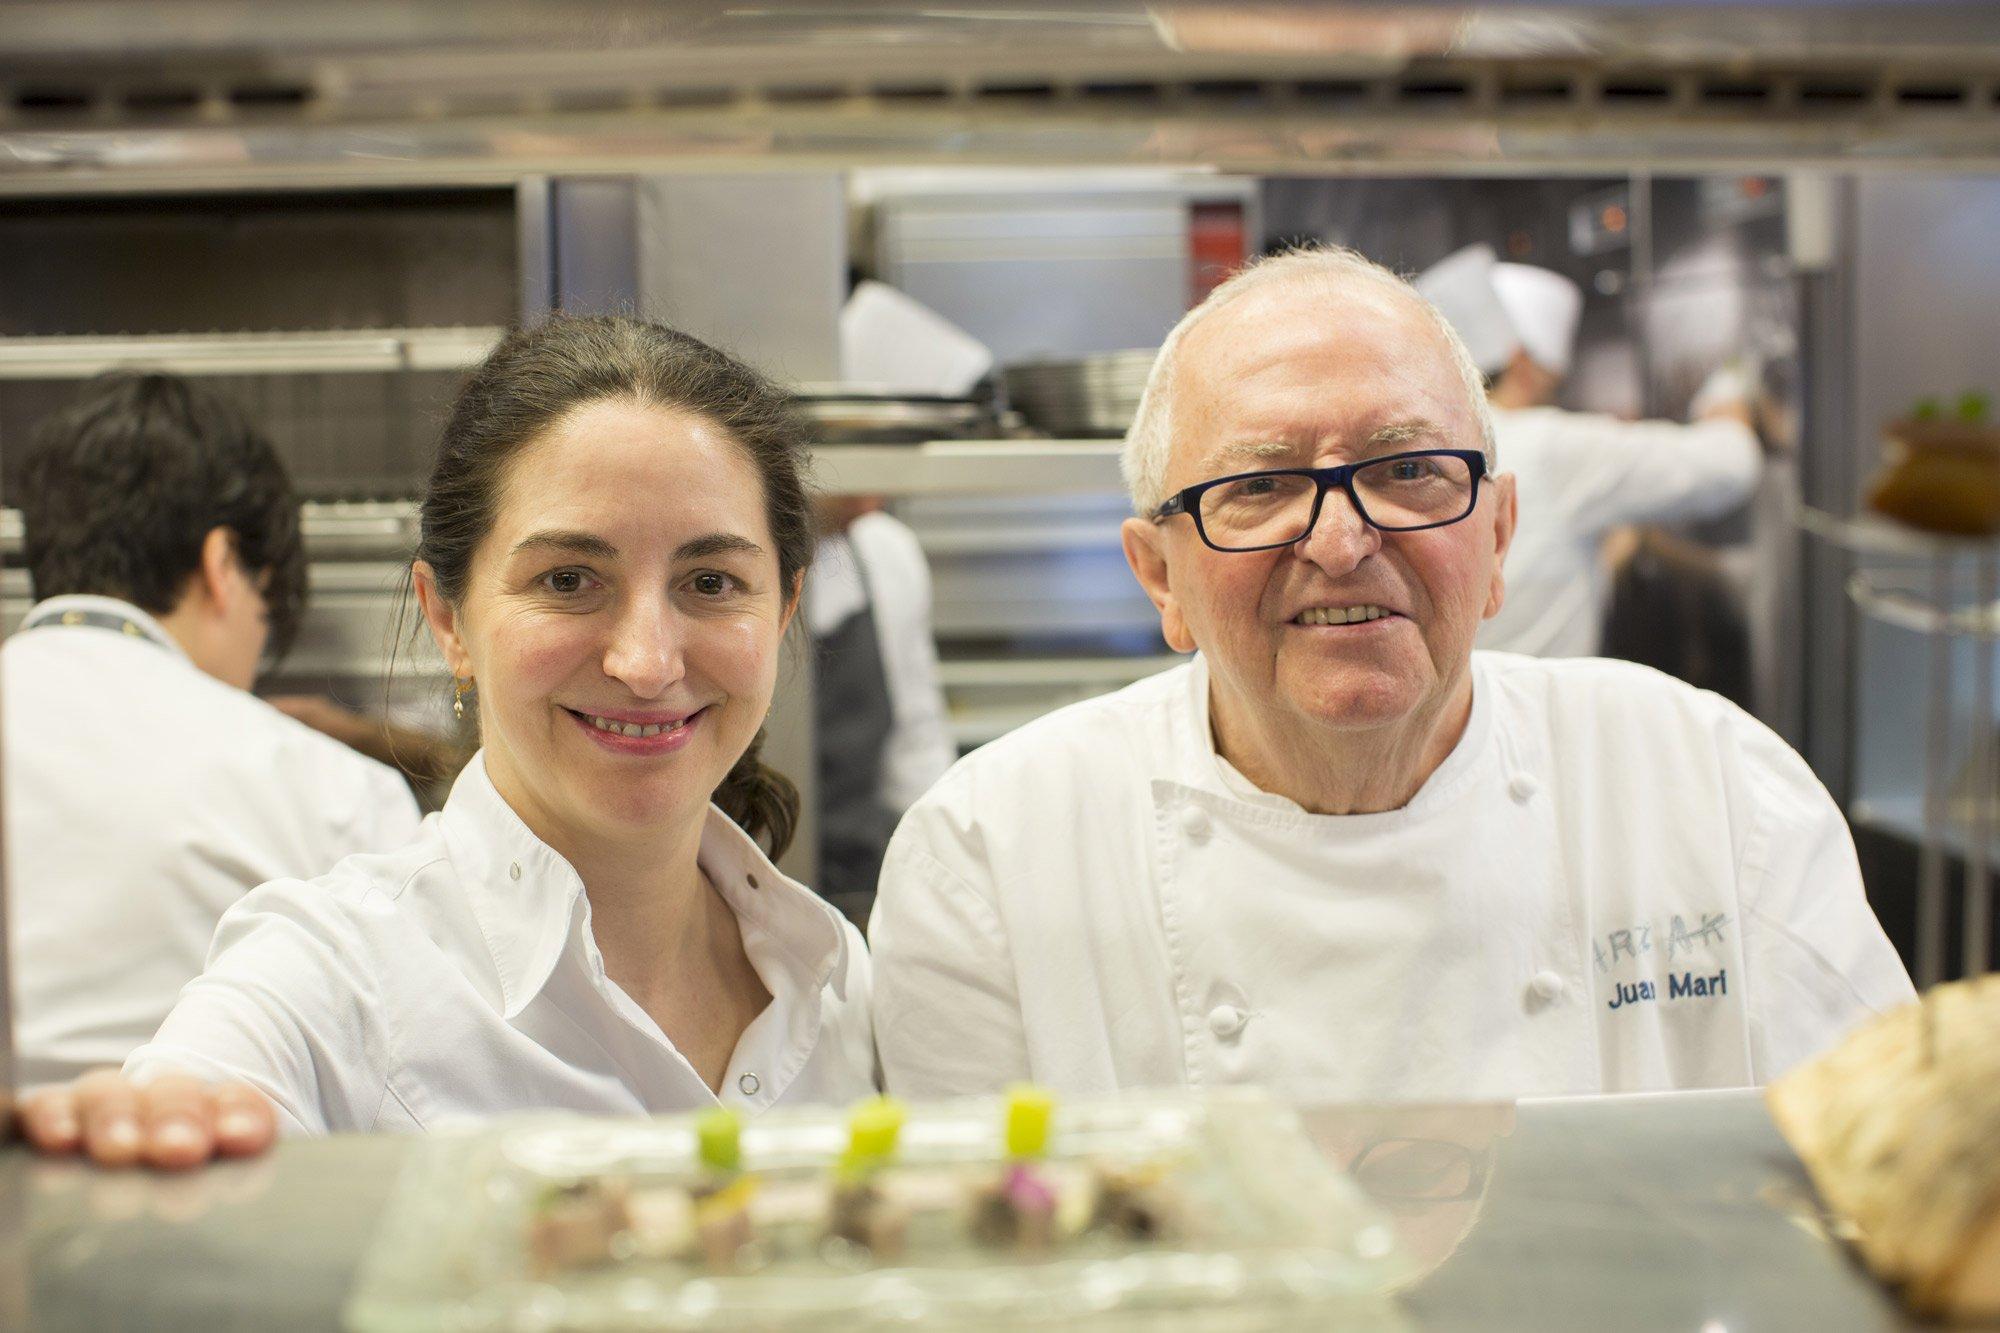 Juan Mari and Elena Arzak in the kitchen at their San Sebastian restaurant © Uxío Da Vila